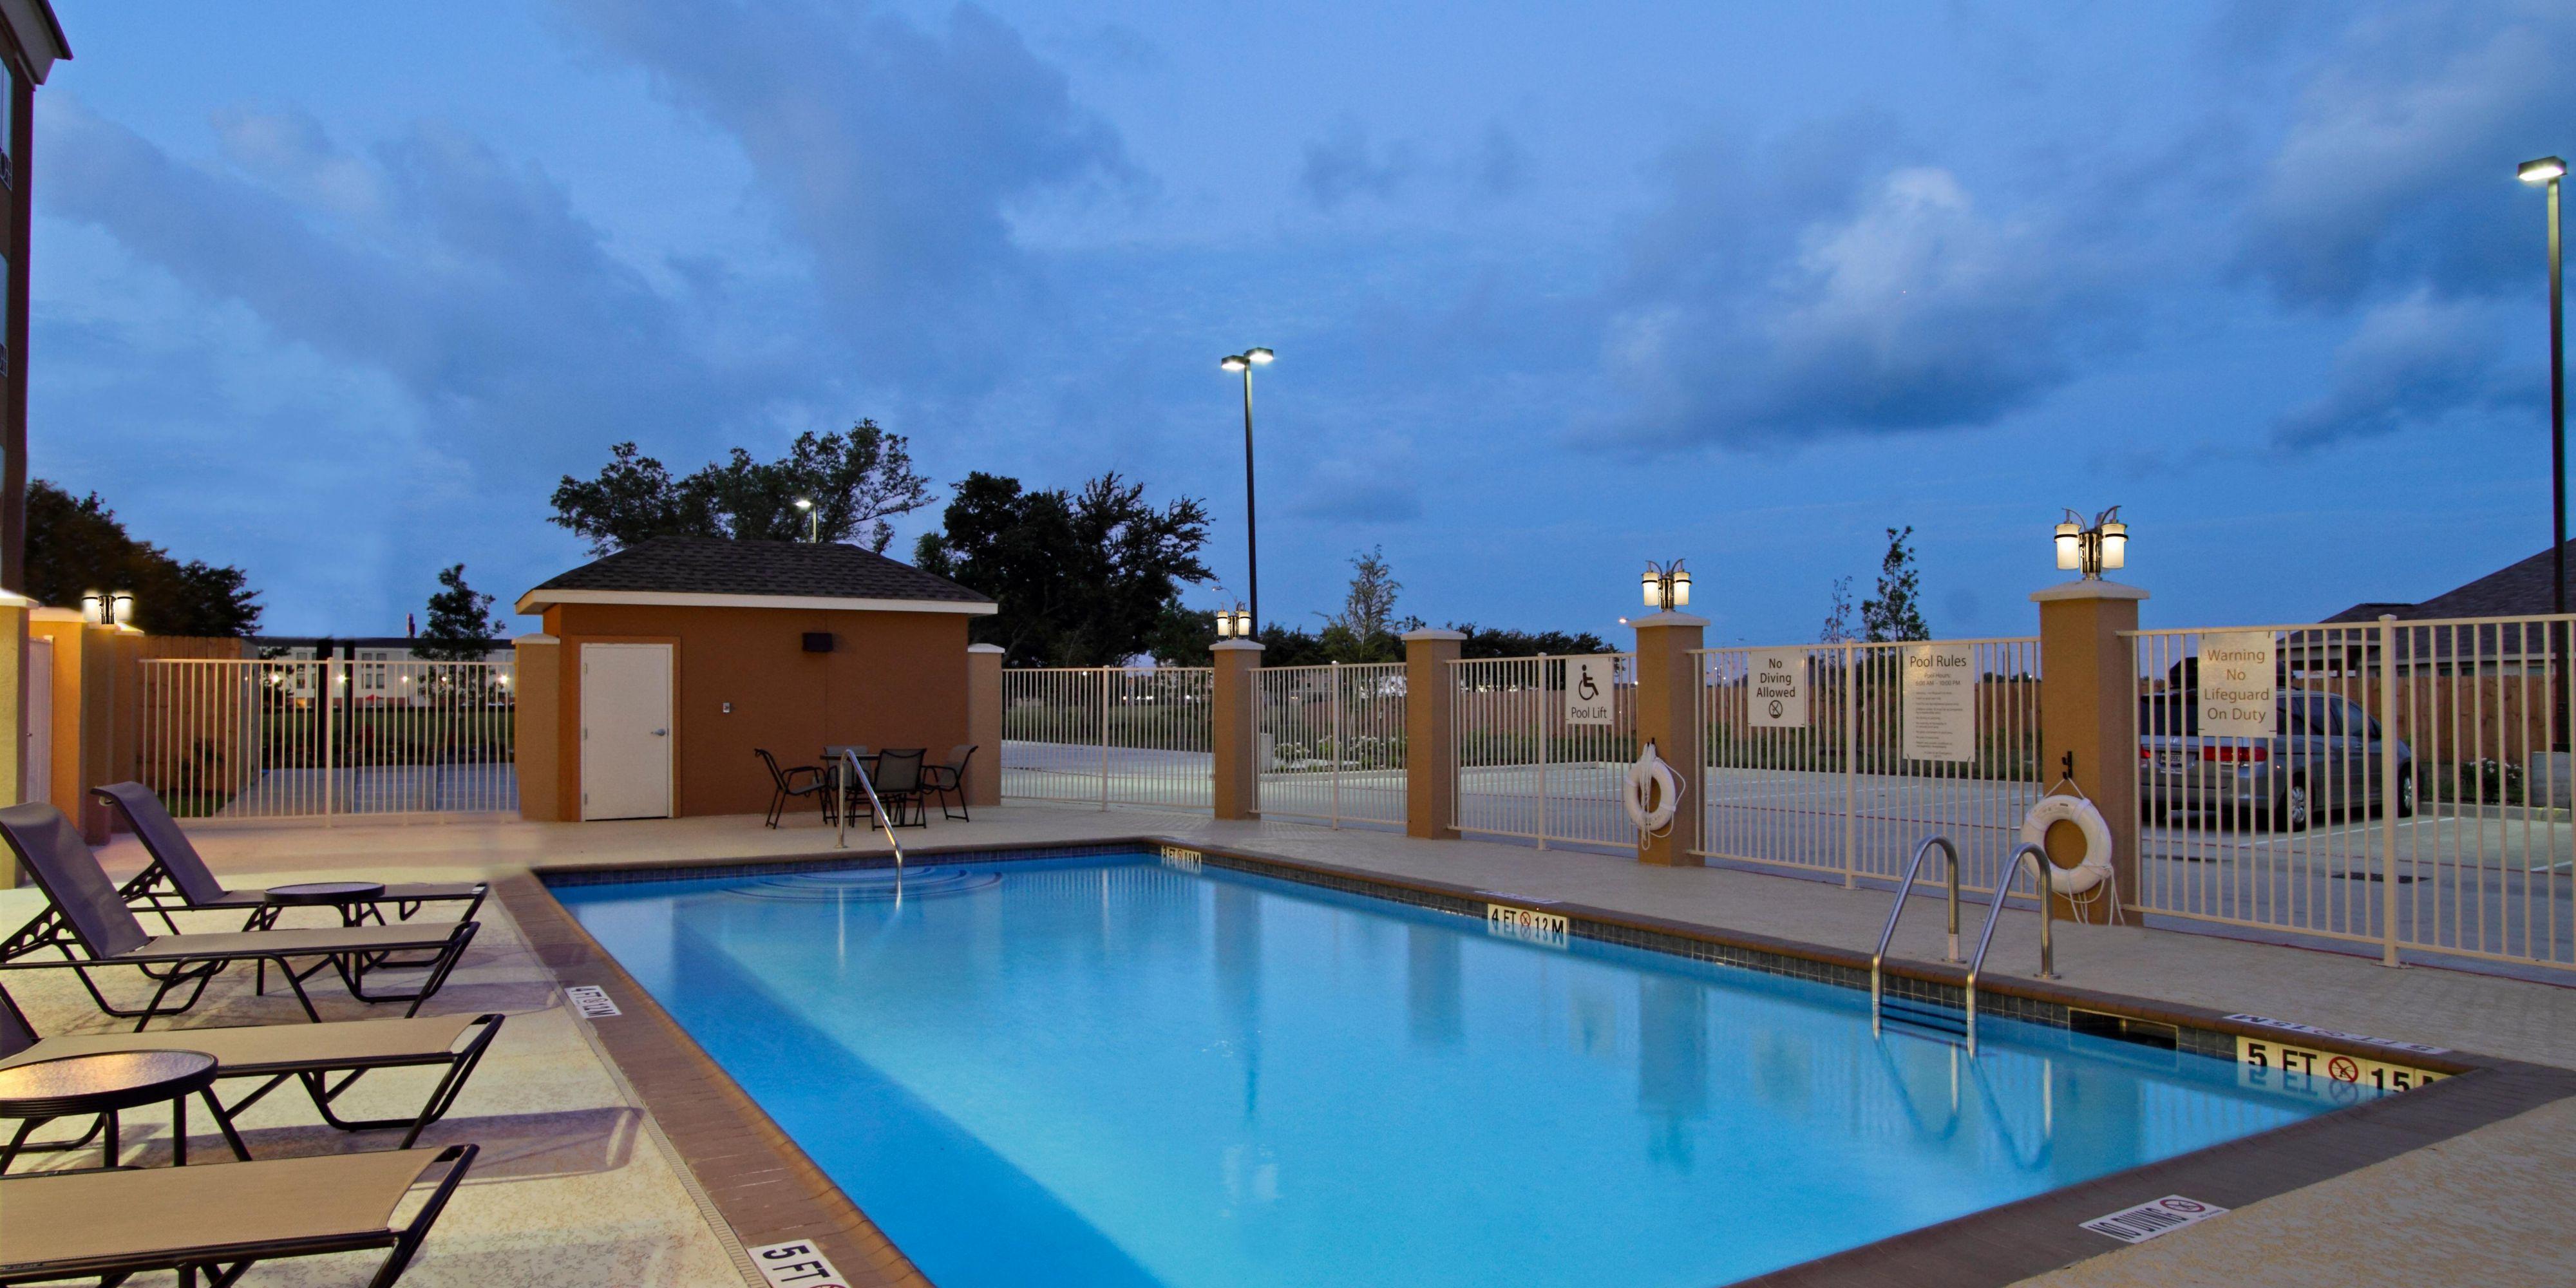 Holiday Inn Express Suites Houston East Baytown Hotel By IHG - Bays inn baytown